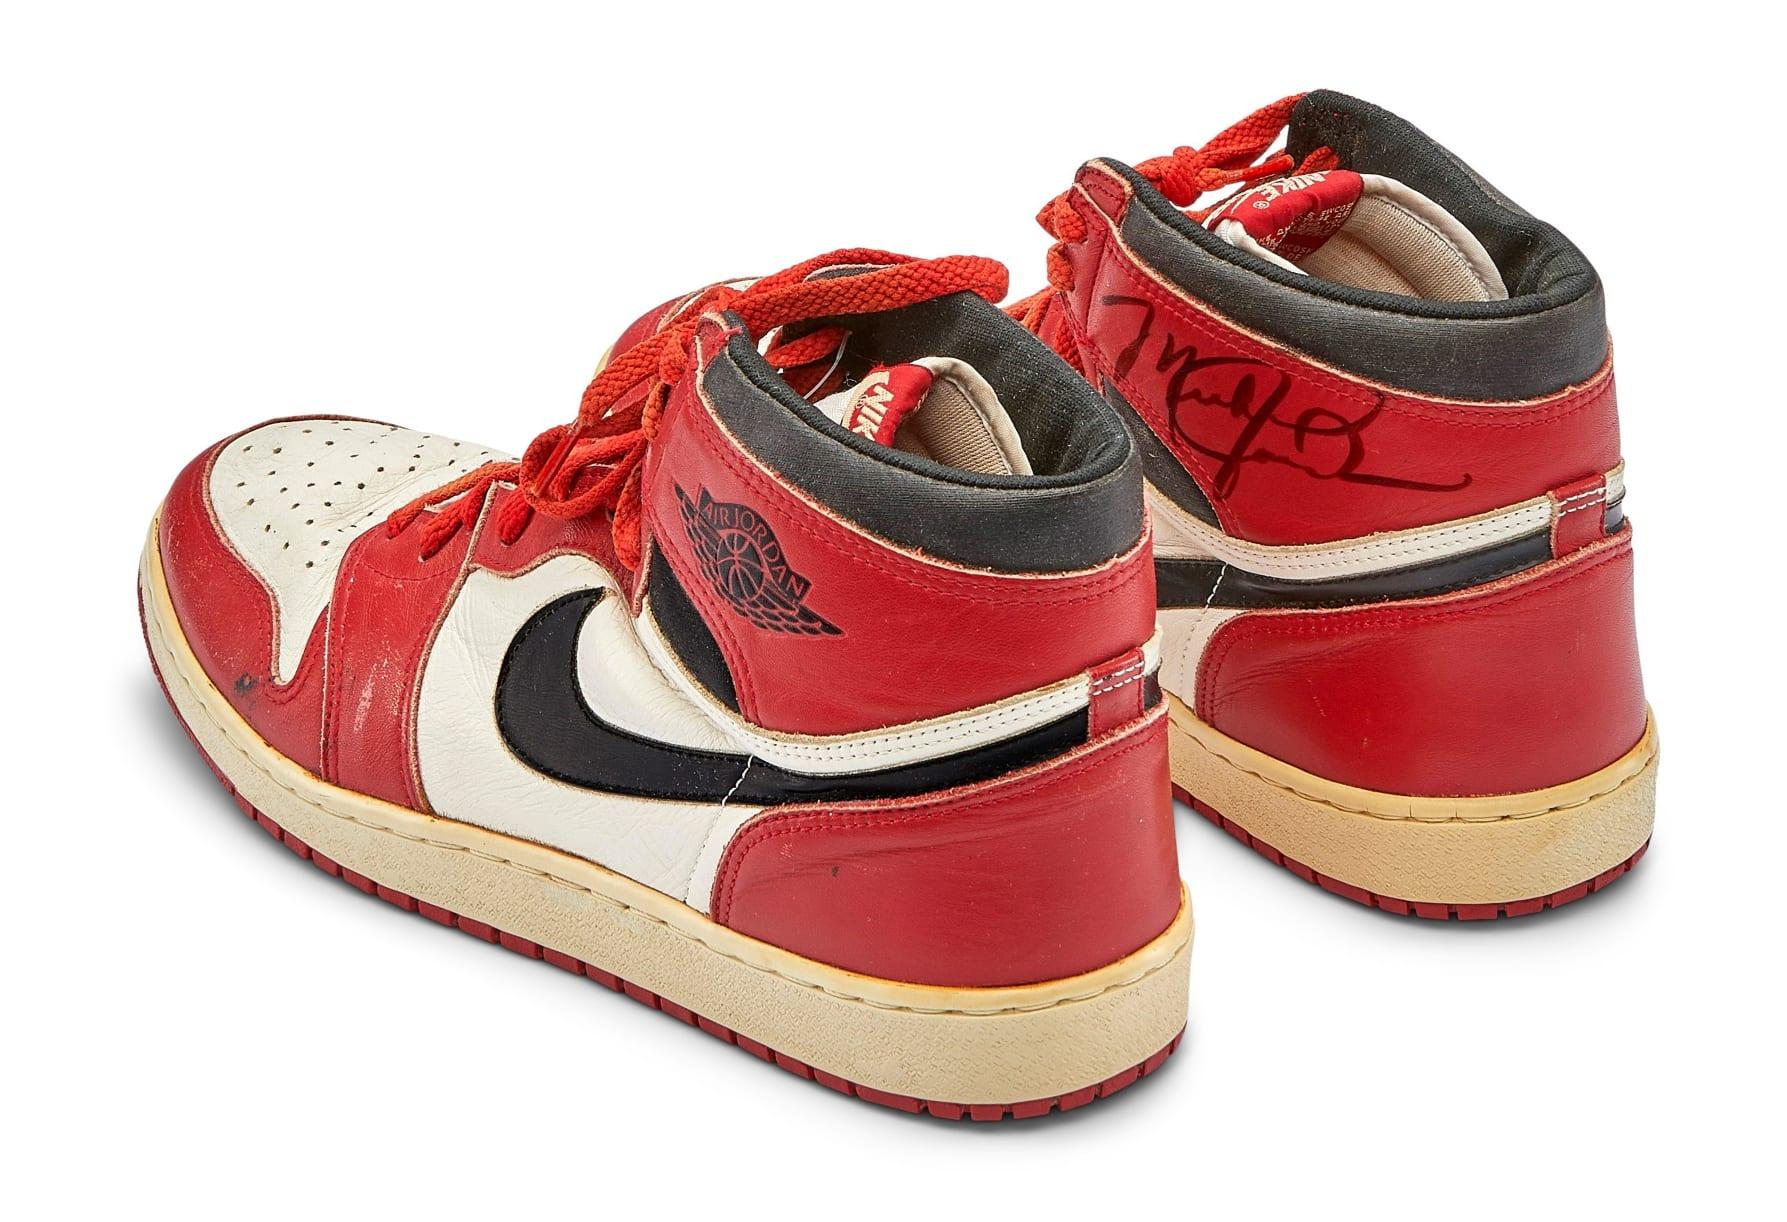 Michael Jordan Game Worn Autographed 1985 Air Jordan 1 High 'Chicago' Heel